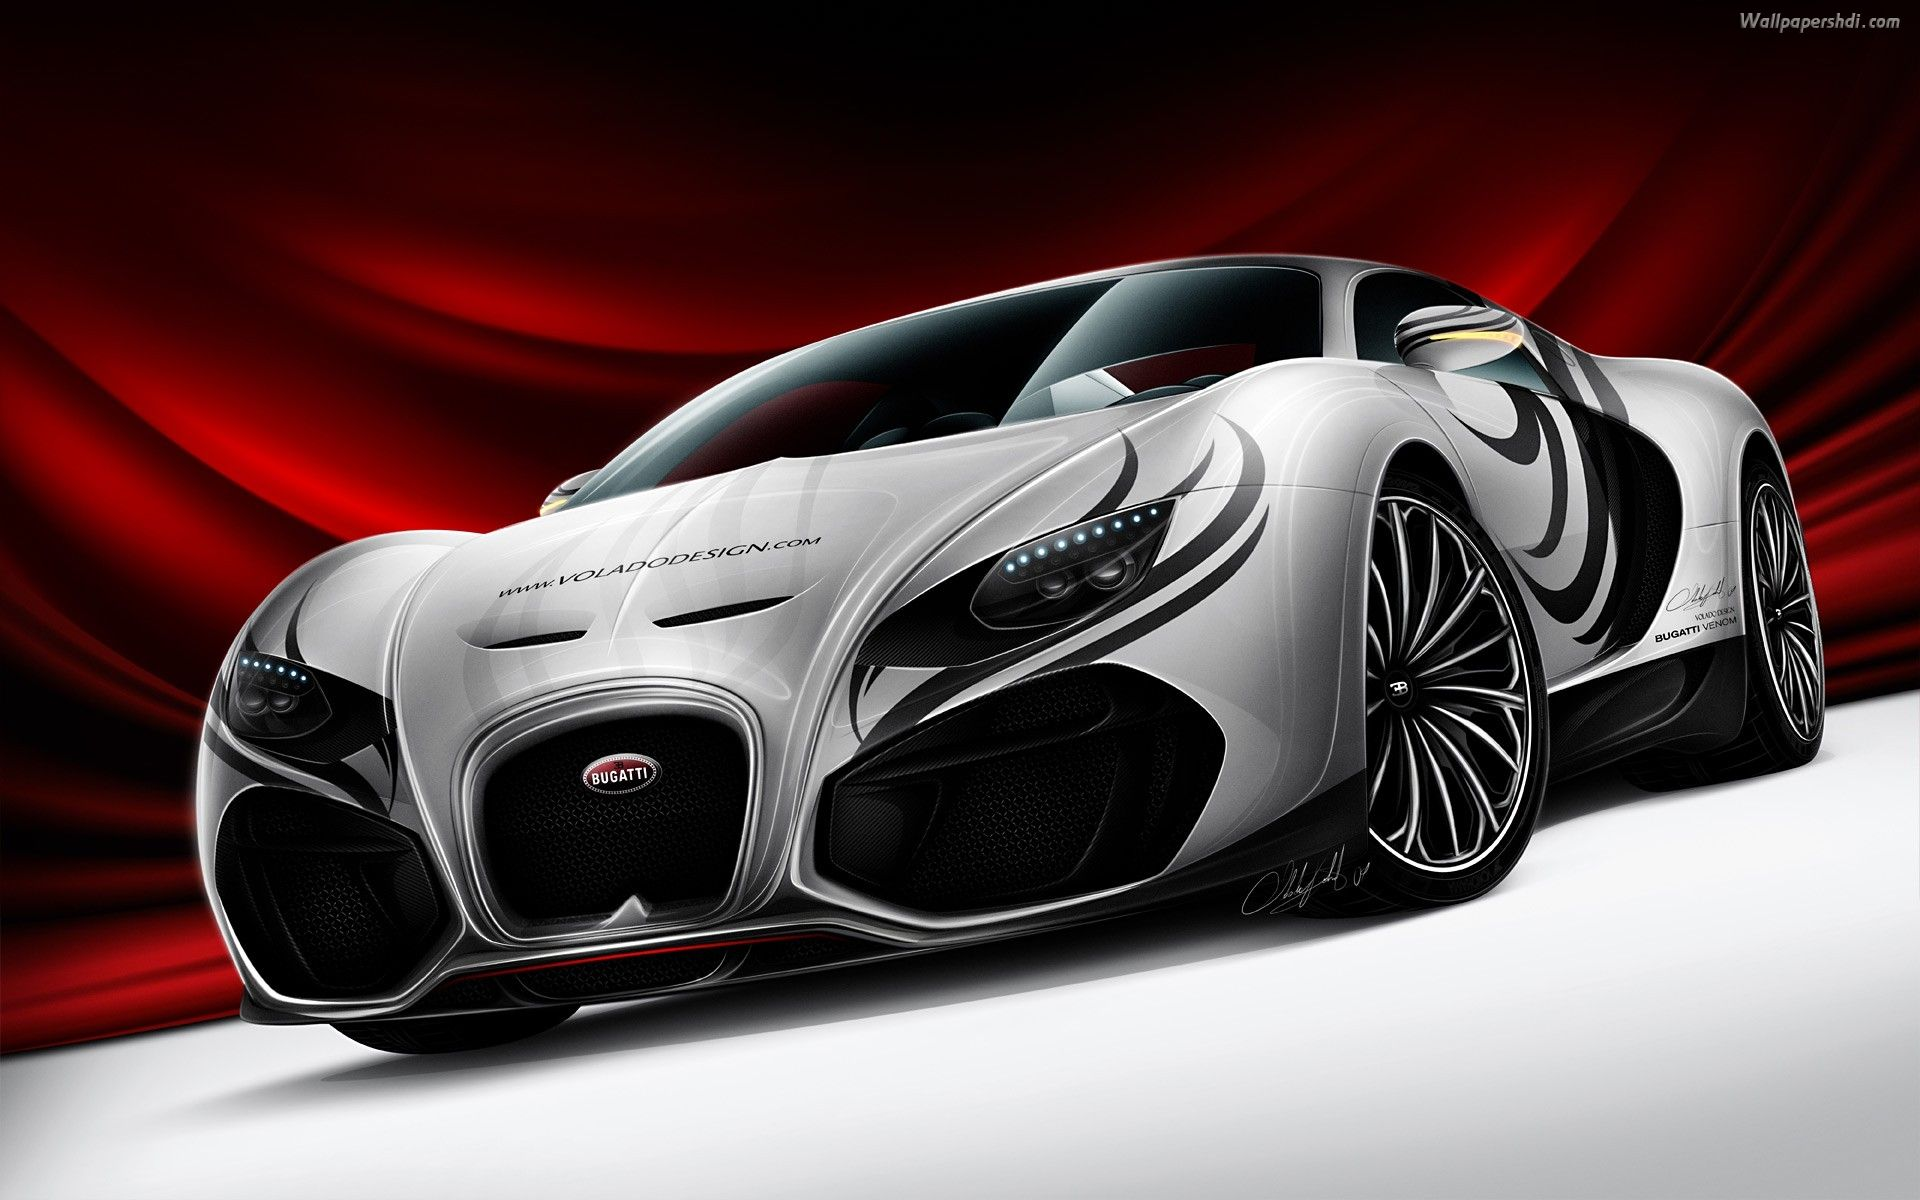 Fabulous Silver Modified Bugatti Veyron Wallpaper Bugatti Concept Bugatti Venom Bugatti